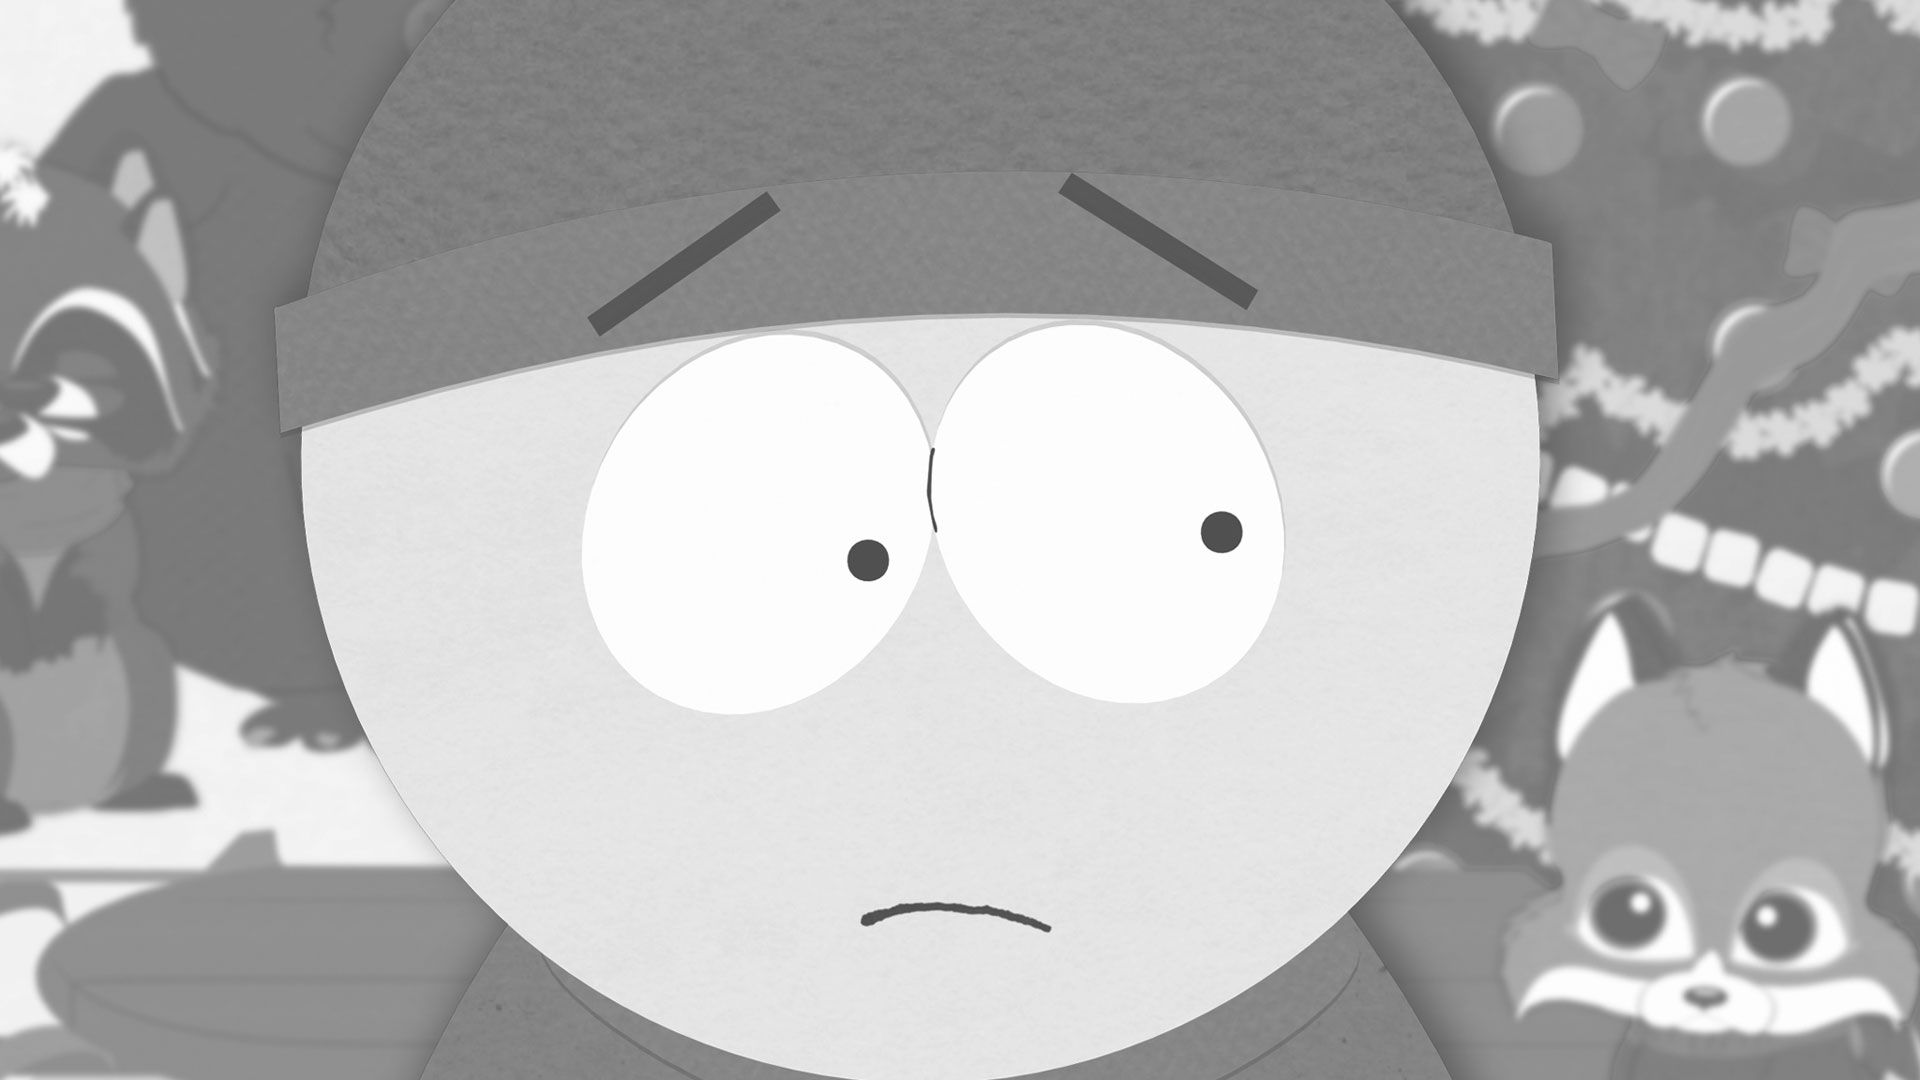 Cartman incredible gift watch : Fresh meat season 2 free